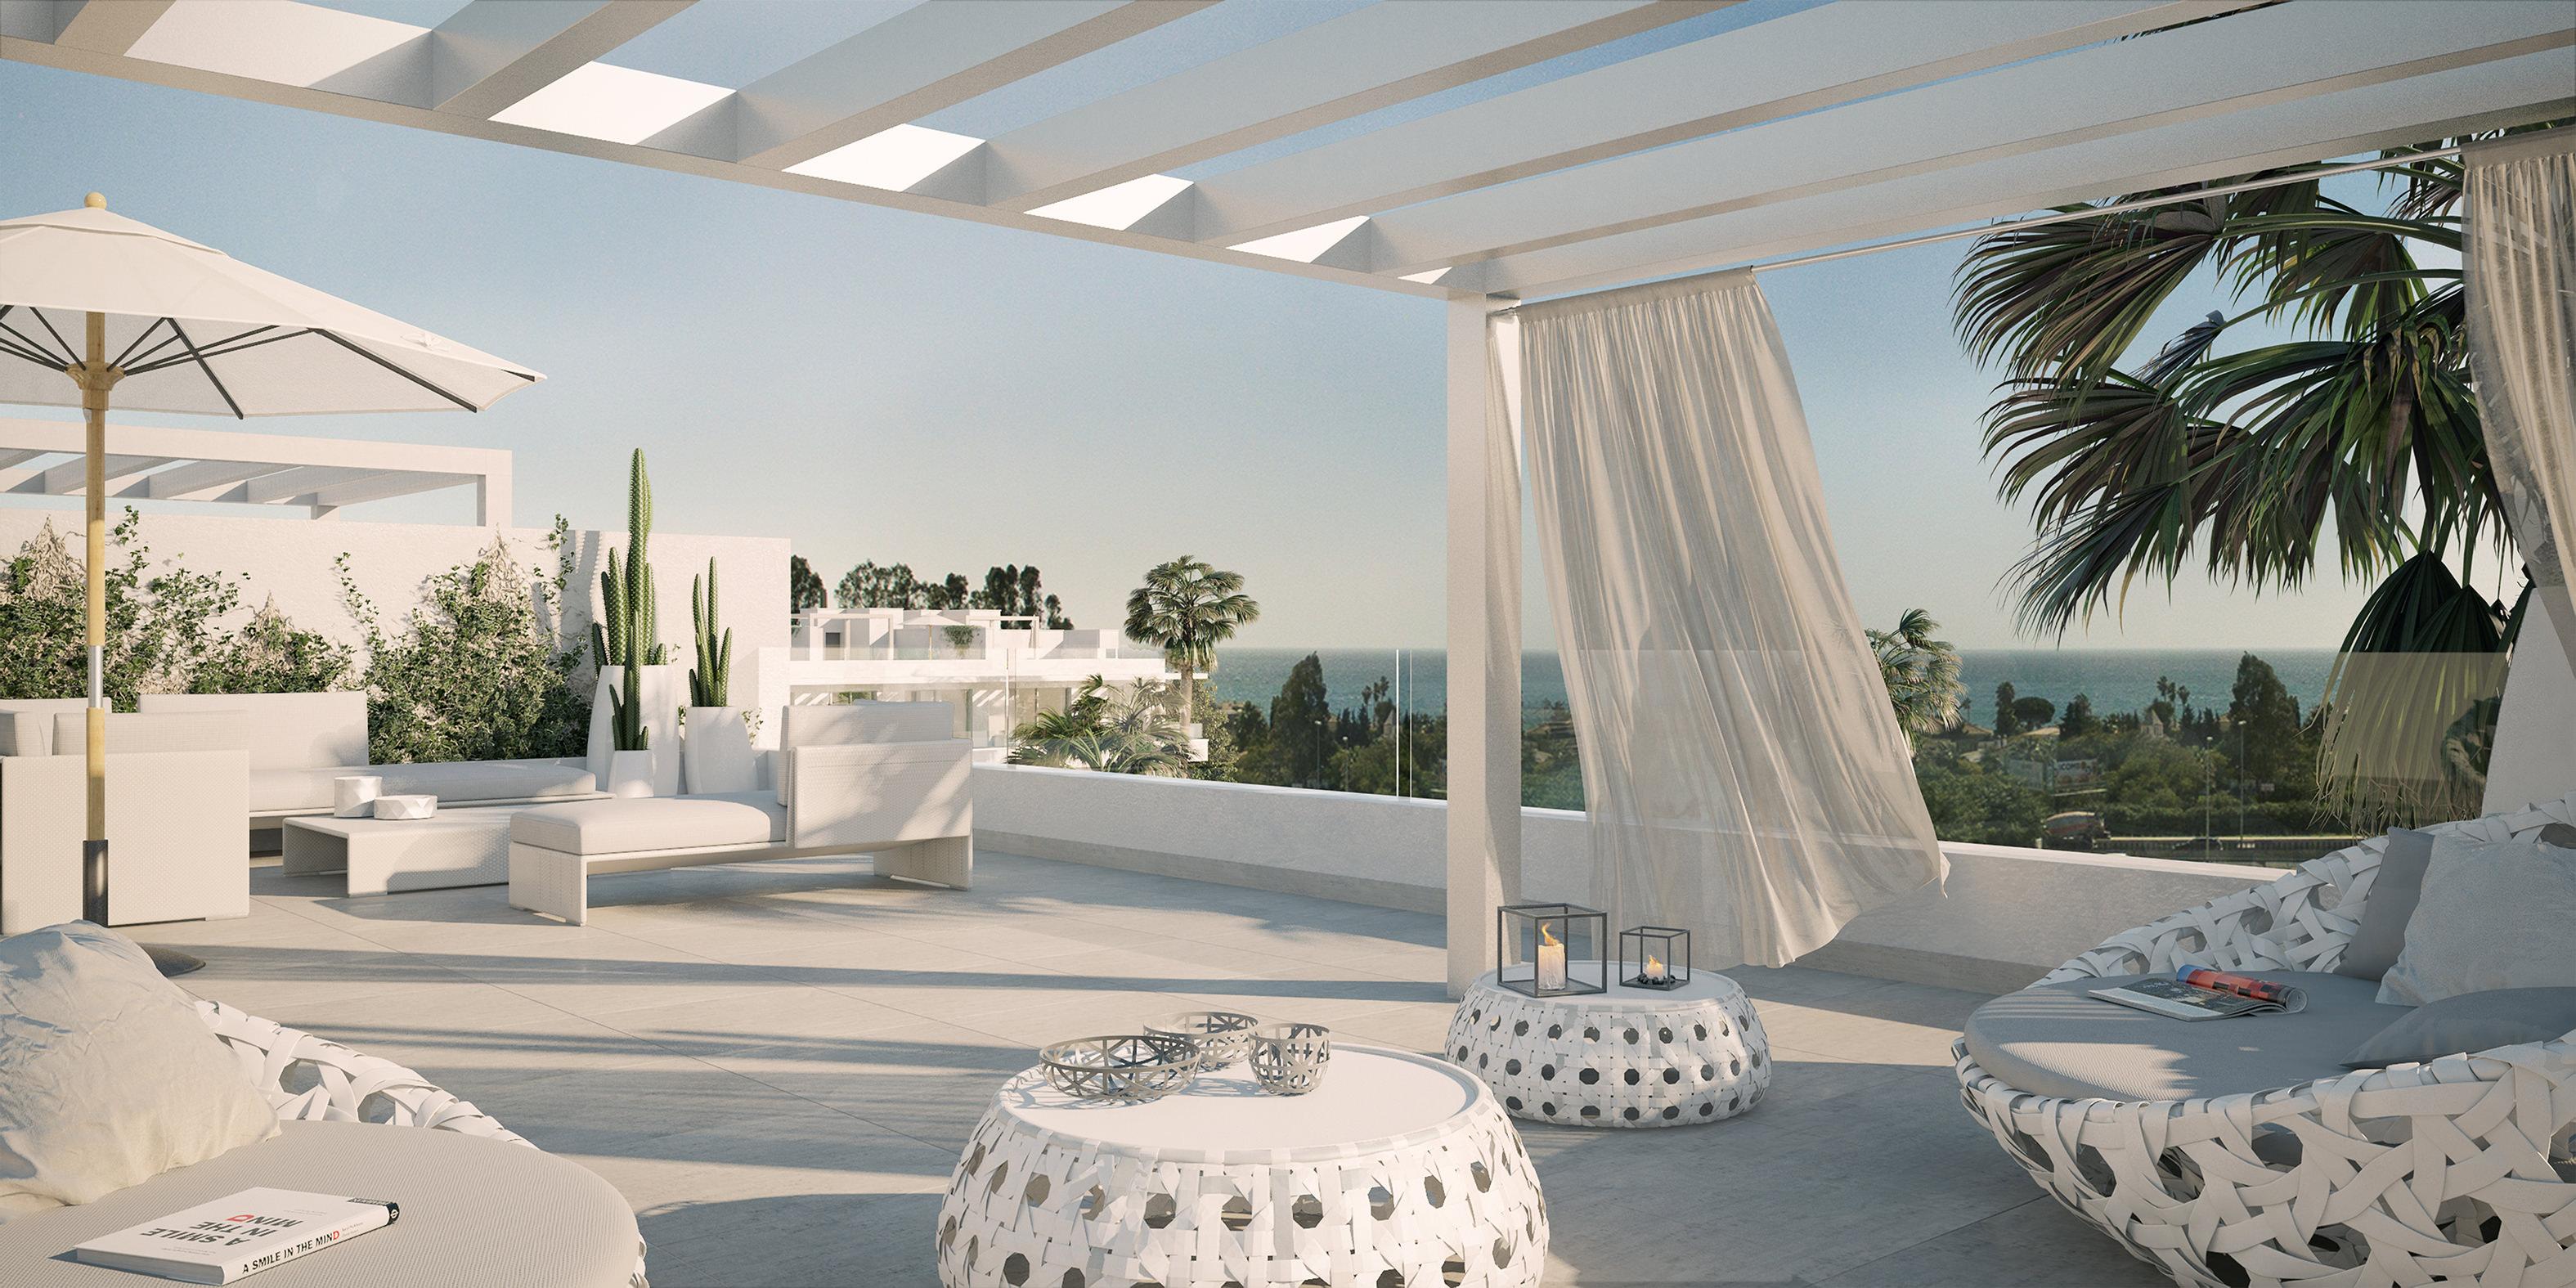 Belaire new development luxury 3 bedroom penthouse Estepona